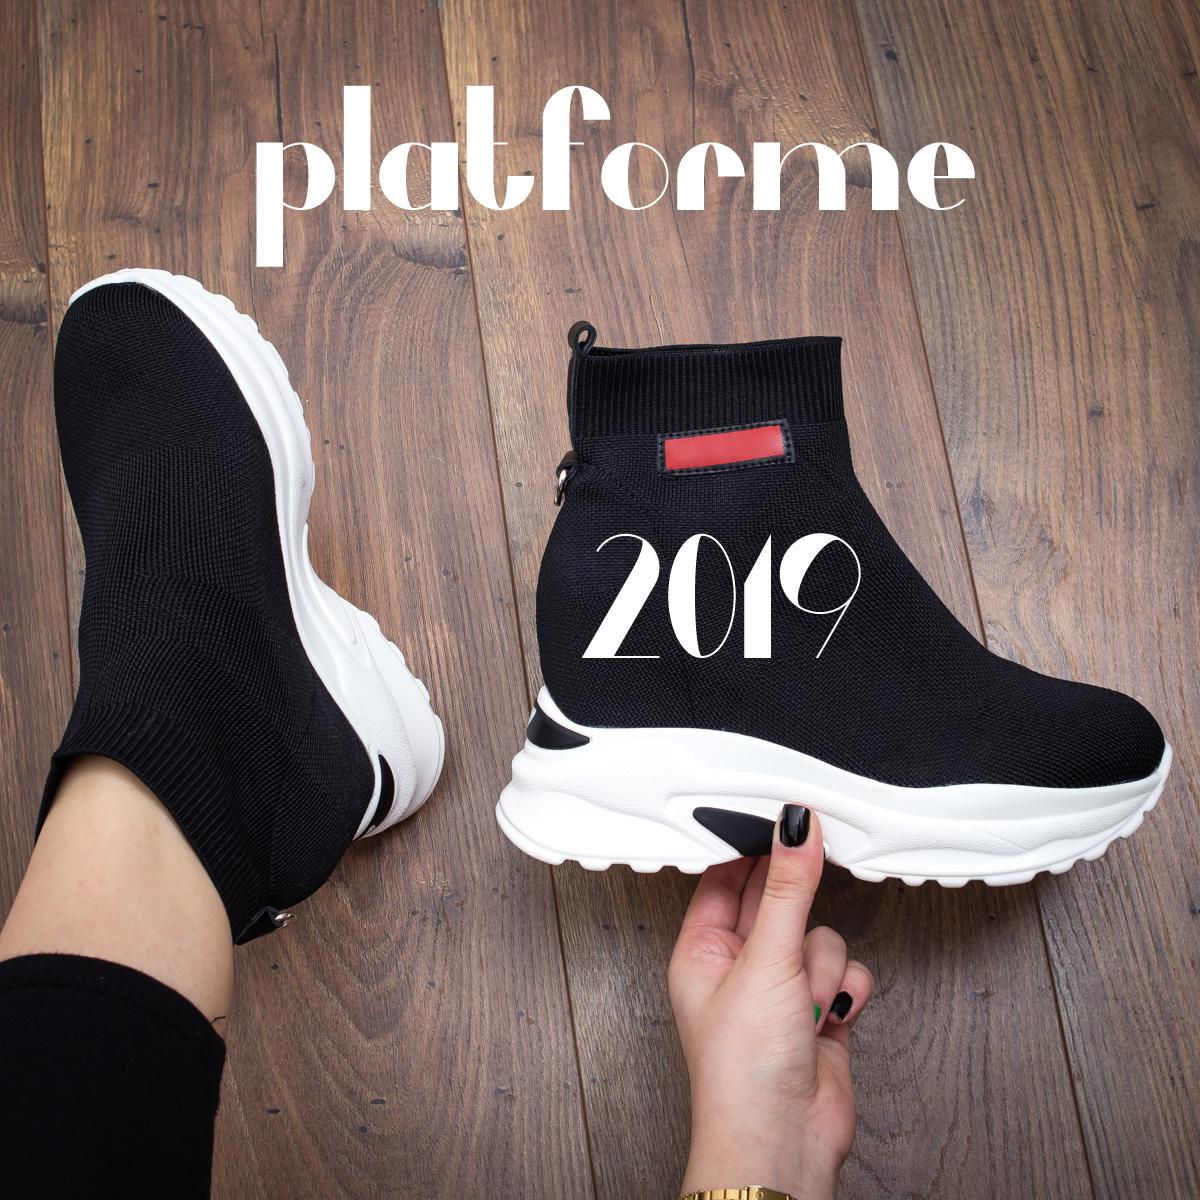 Adidasi cu platforma inalta negri, argintii, albi la moda 2019 ieftini